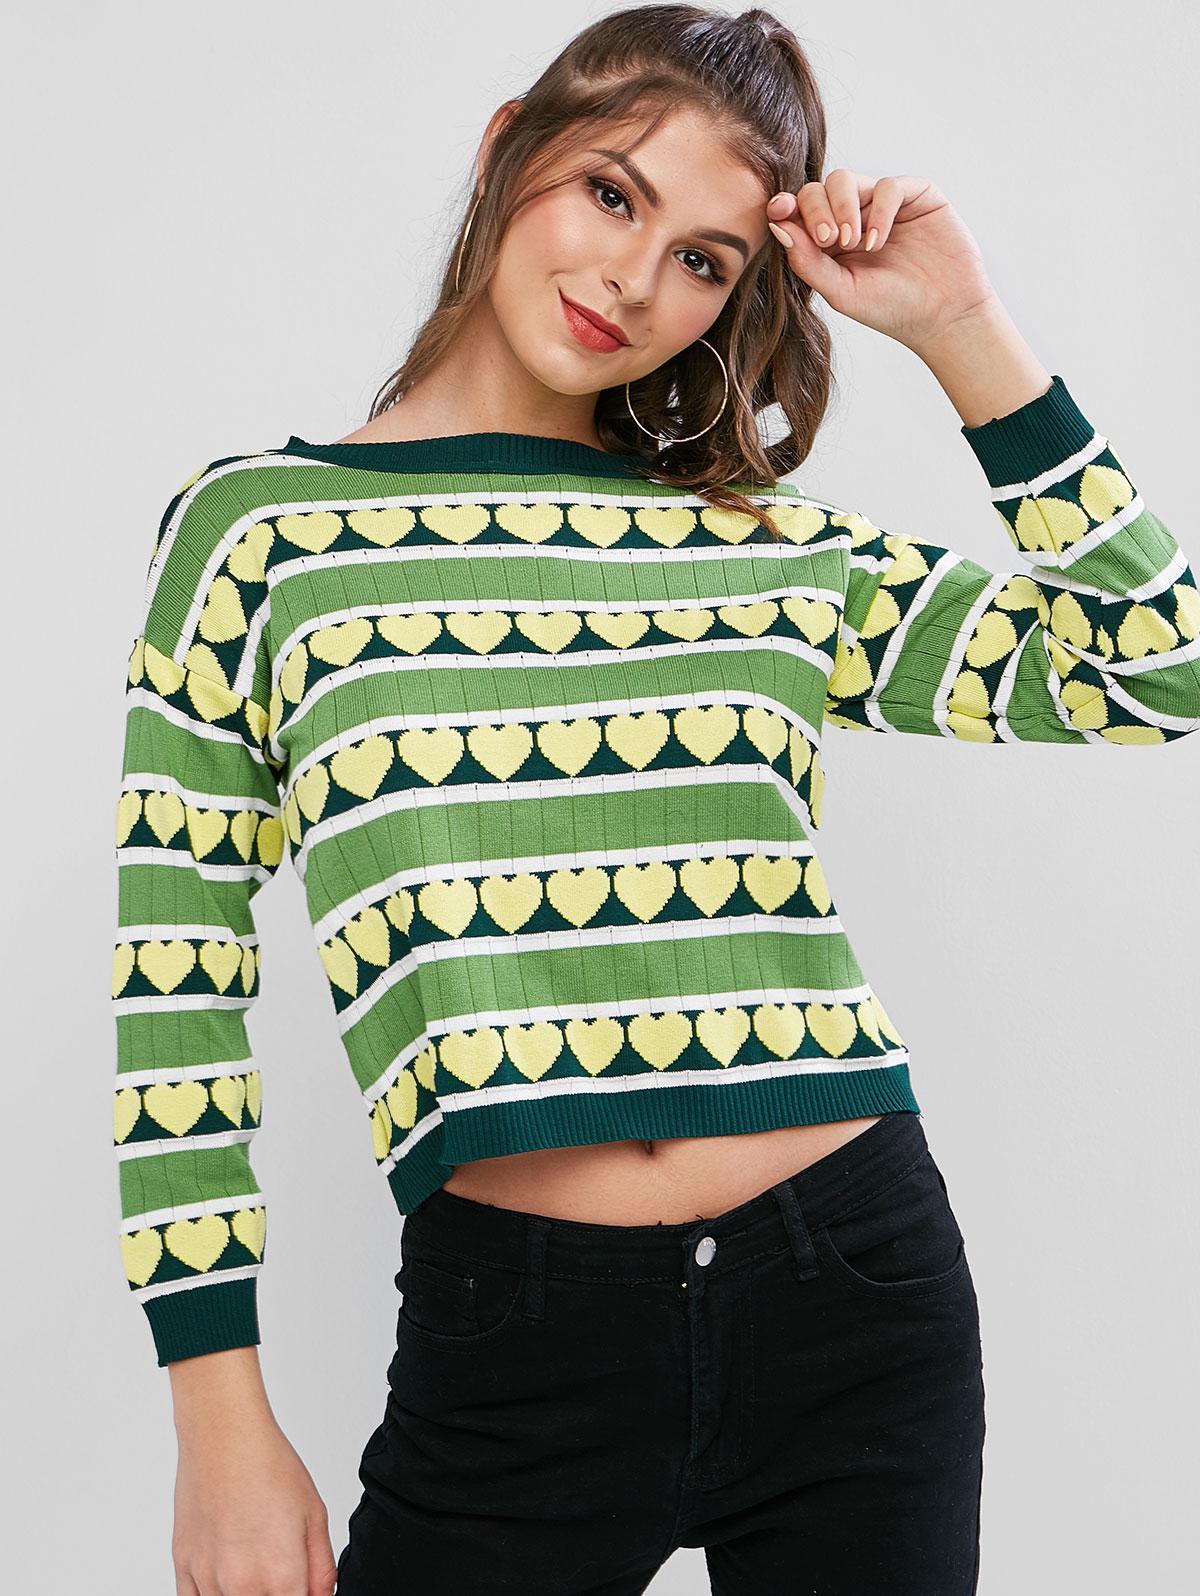 Crew Neck Stripes Heart Graphic Pullover Sweater